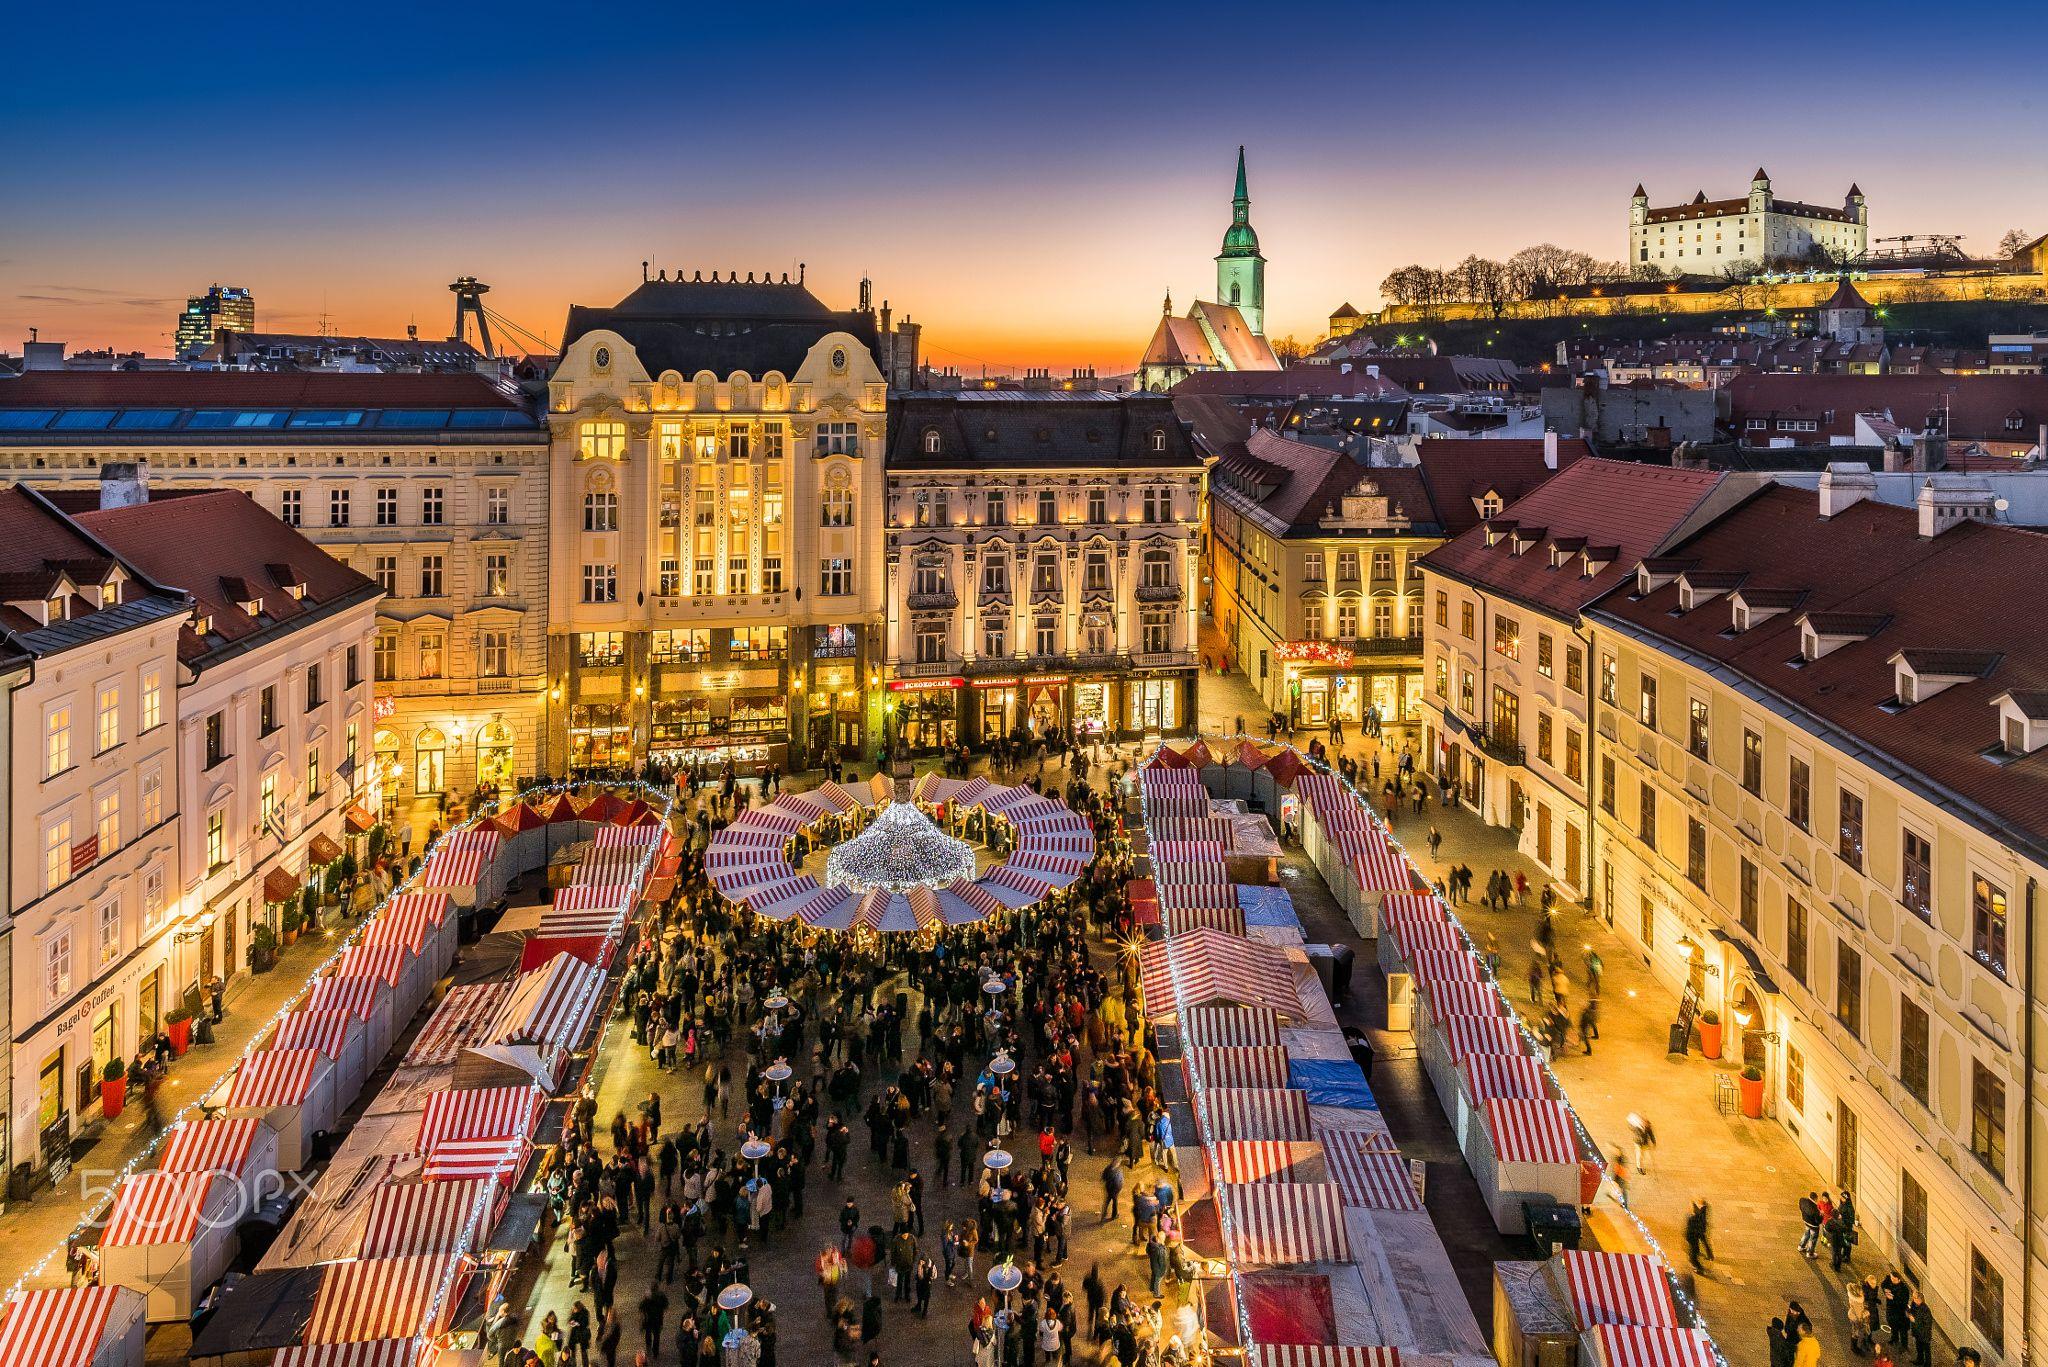 Christmas Bratislava.Christmas Market In Bratislava View To Traditional